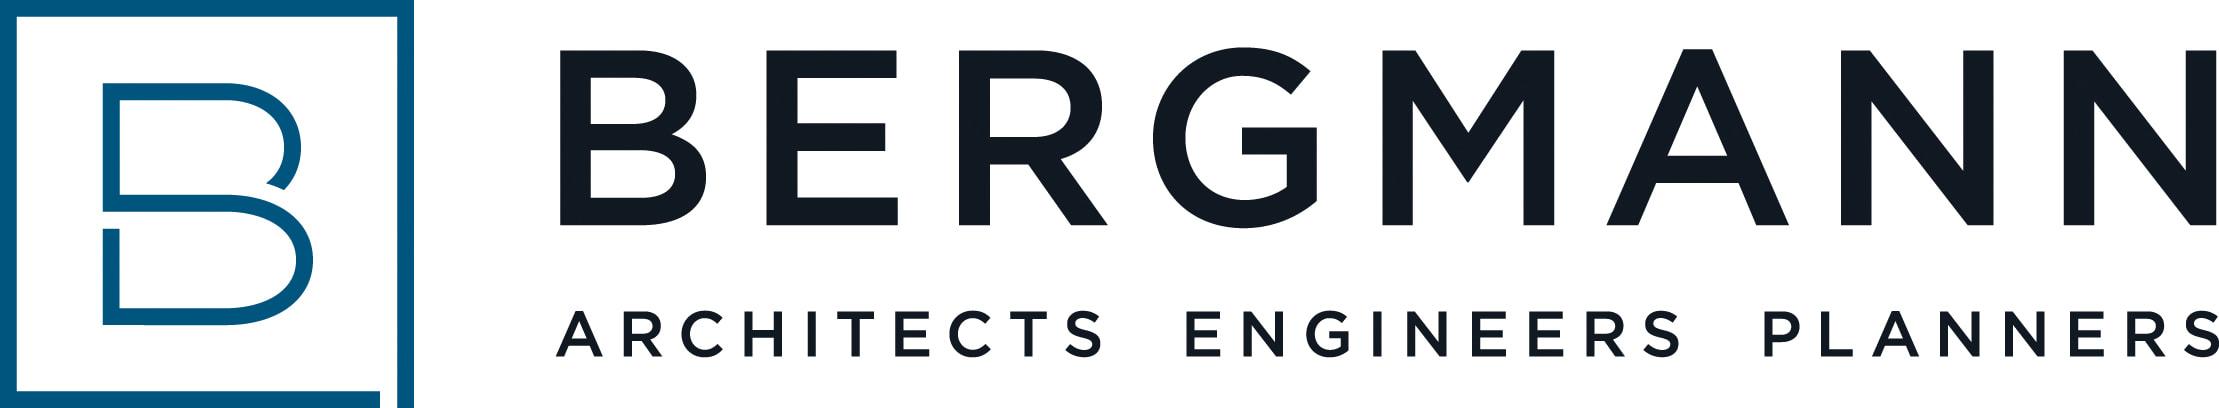 bergmann-h-logo-color_orig.jpg